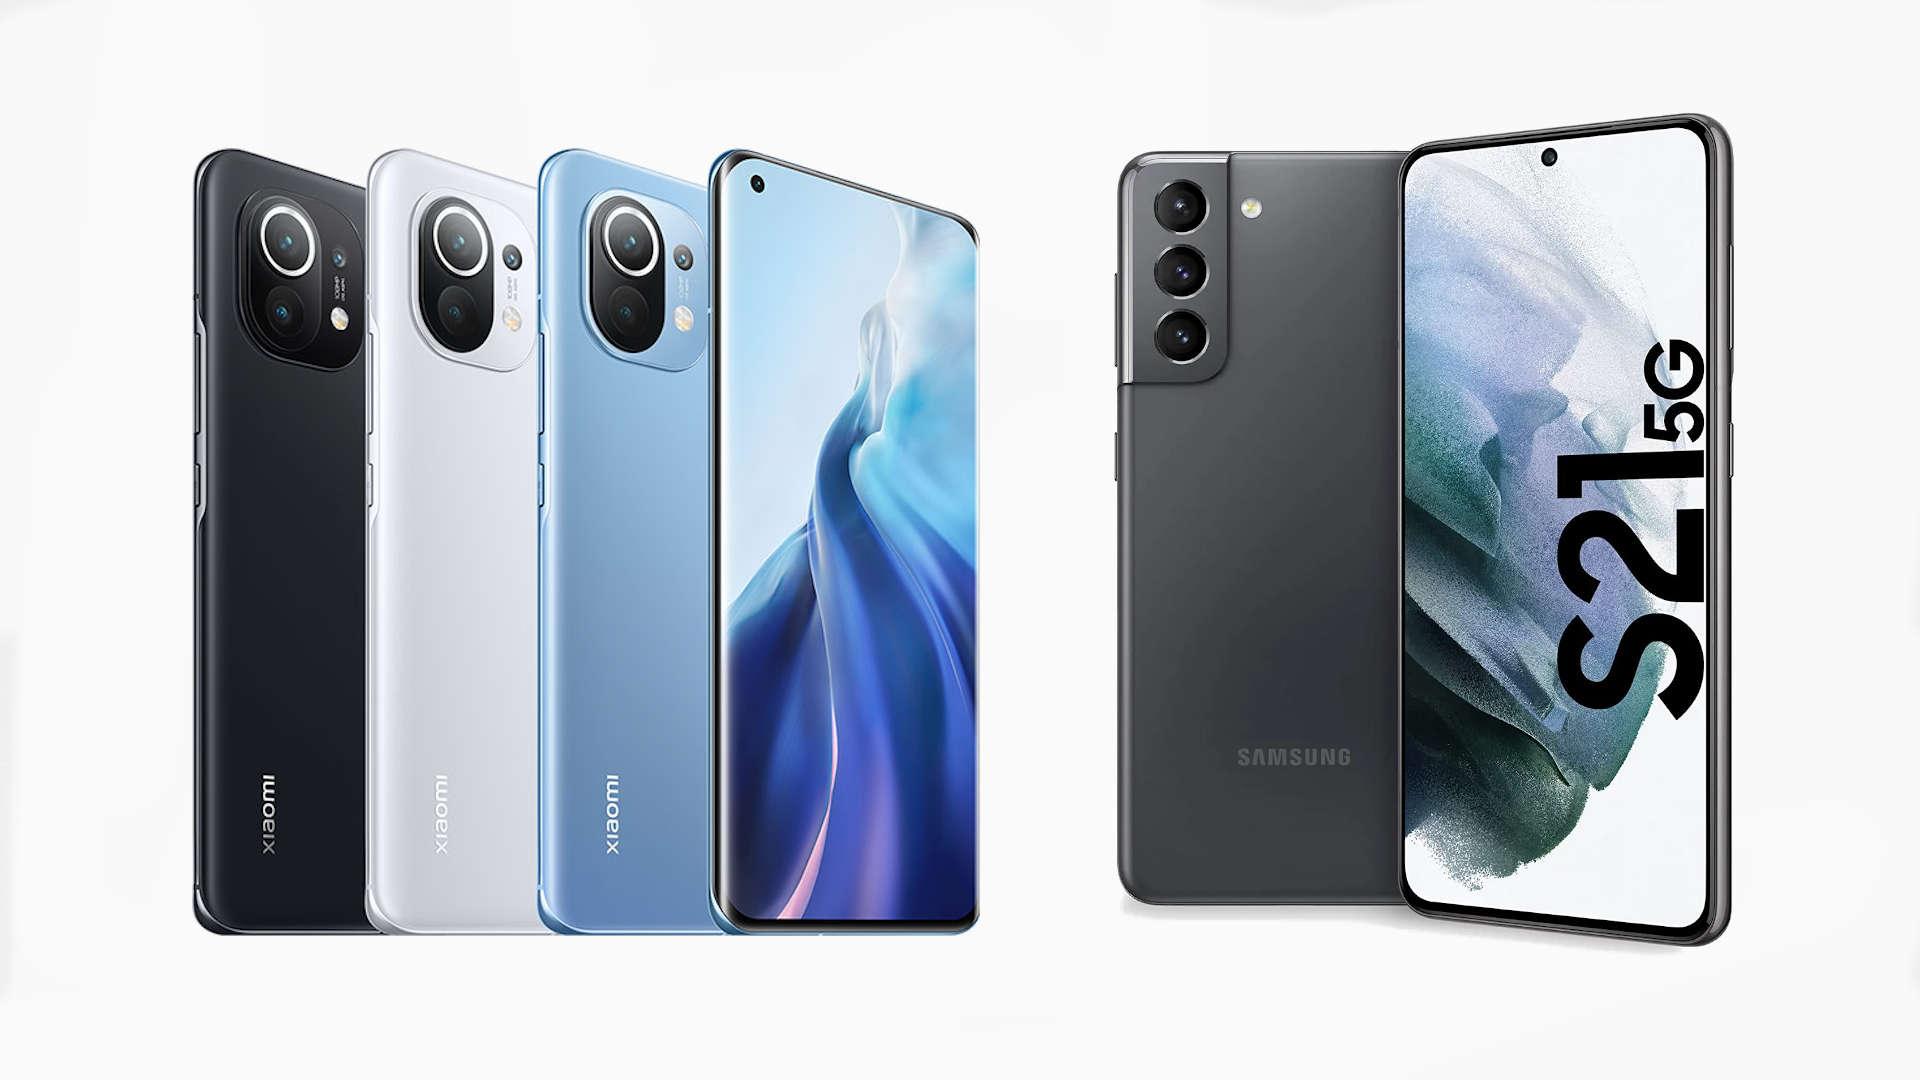 Xiaomi Mi 11 vs Samsung Galaxy S21